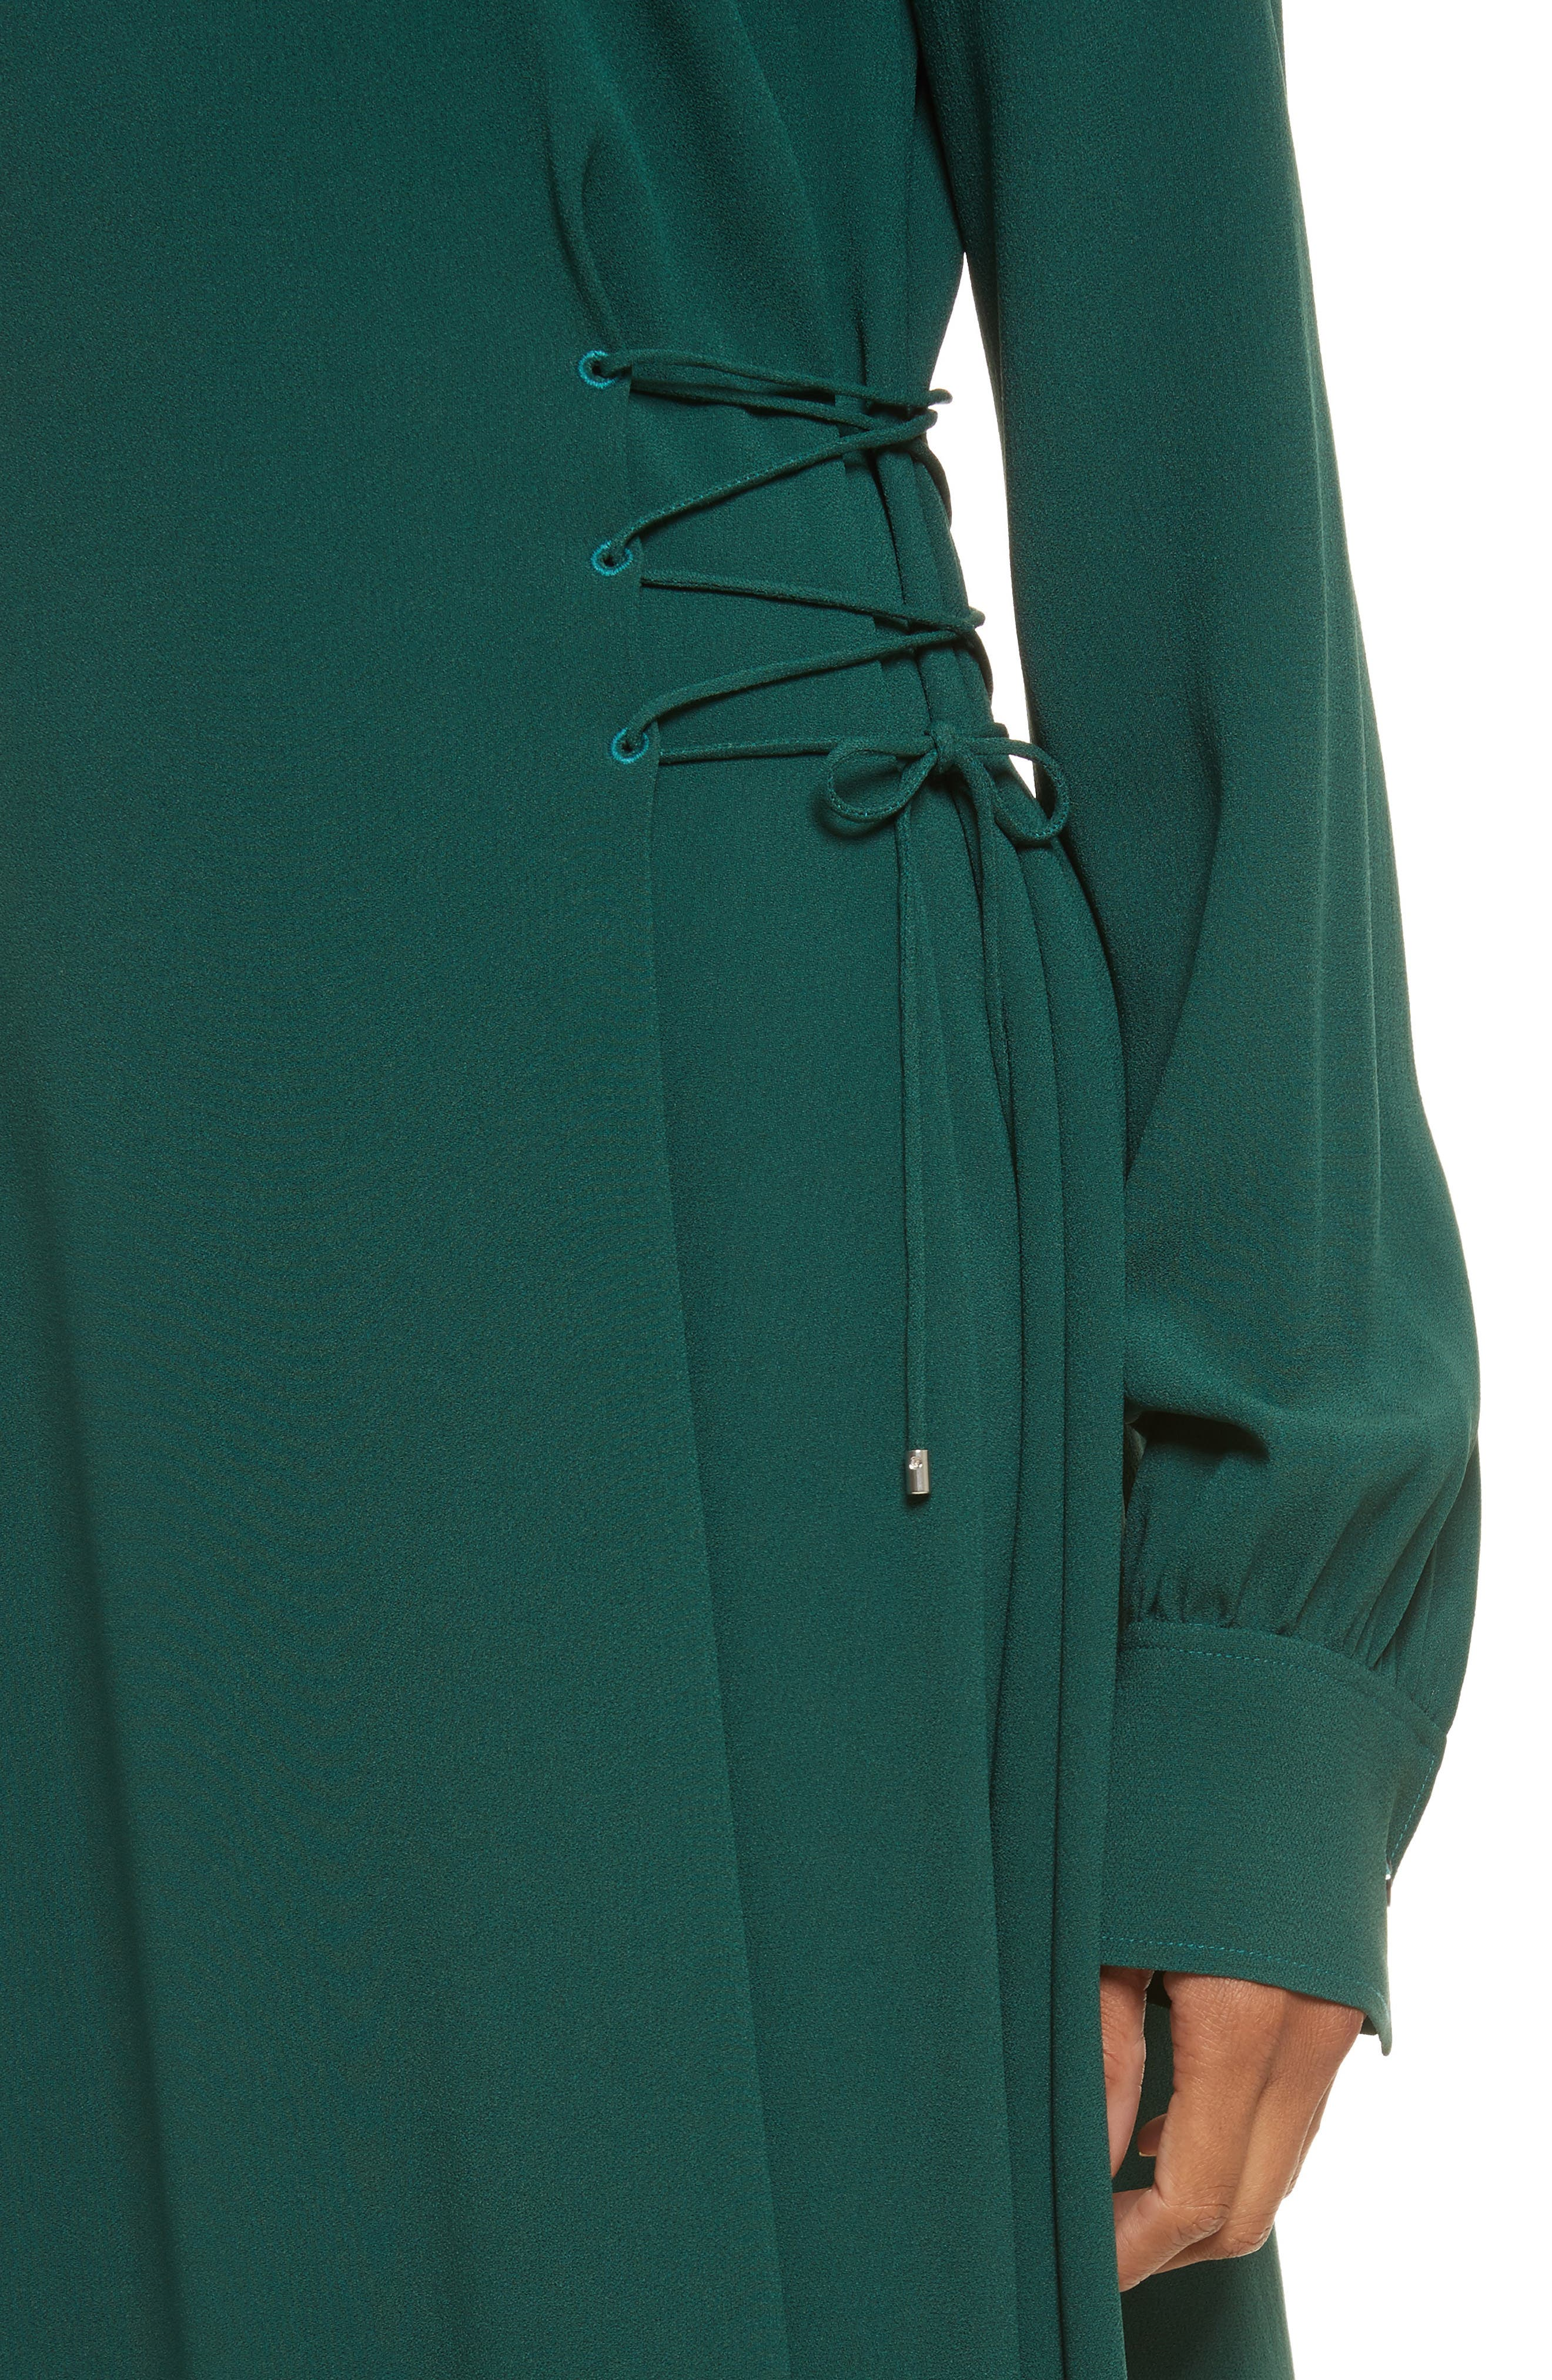 Kensington Lace-Up A-Line Dress,                             Alternate thumbnail 4, color,                             Bright Hunter